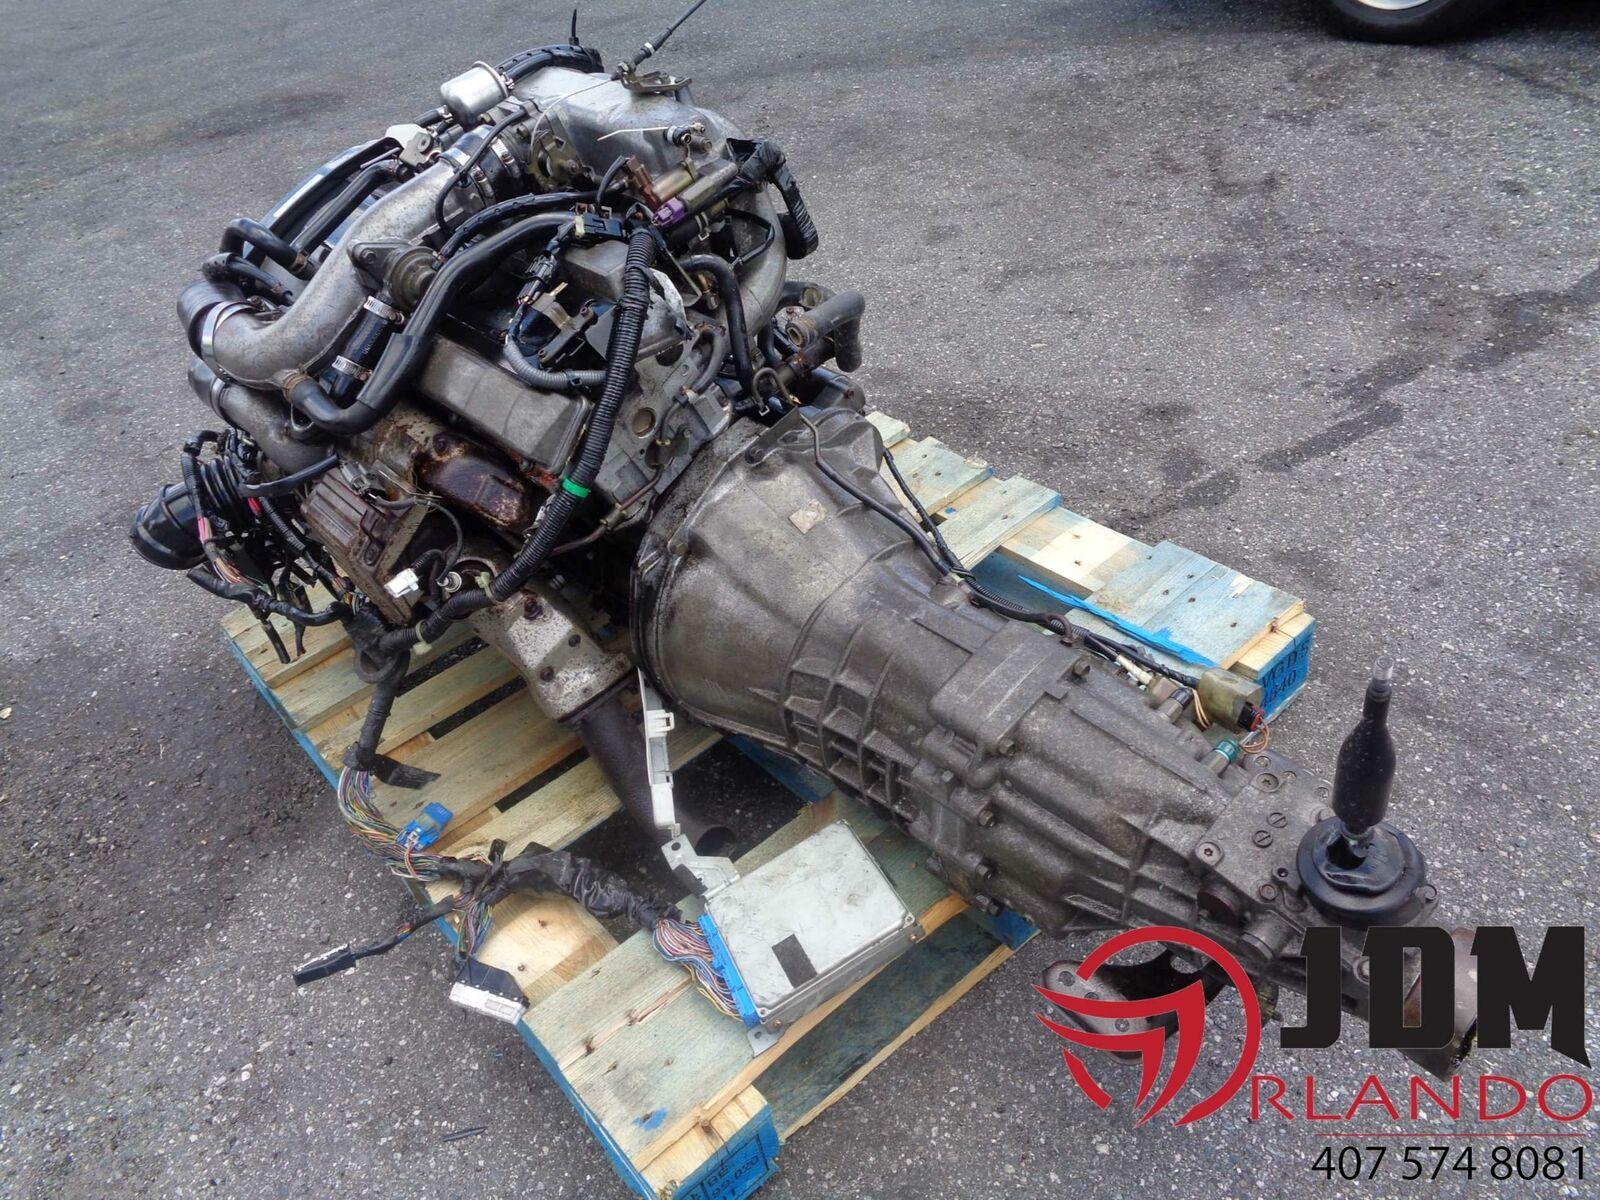 NISSAN SKYLINE R32 GTST 2 5L TURBO ENGINE MANUAL TRANS LOOM & ECU JDM  RB25DET S2